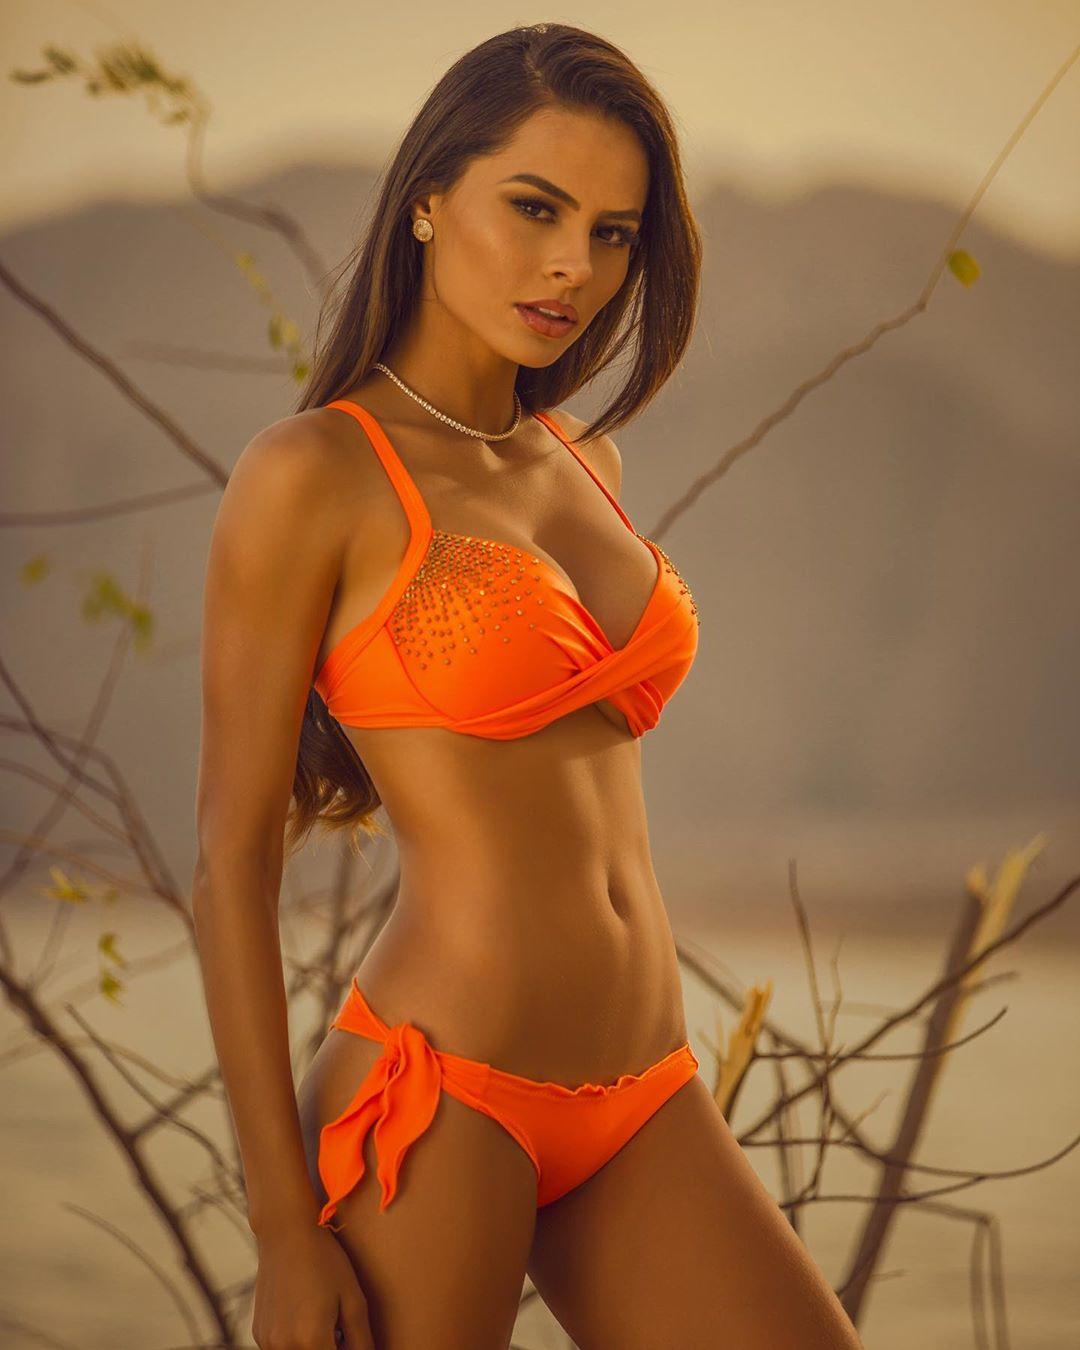 stephany pim, miss eco brasil 2017/top 3 de miss brasil universo 2017. - Página 10 10691310